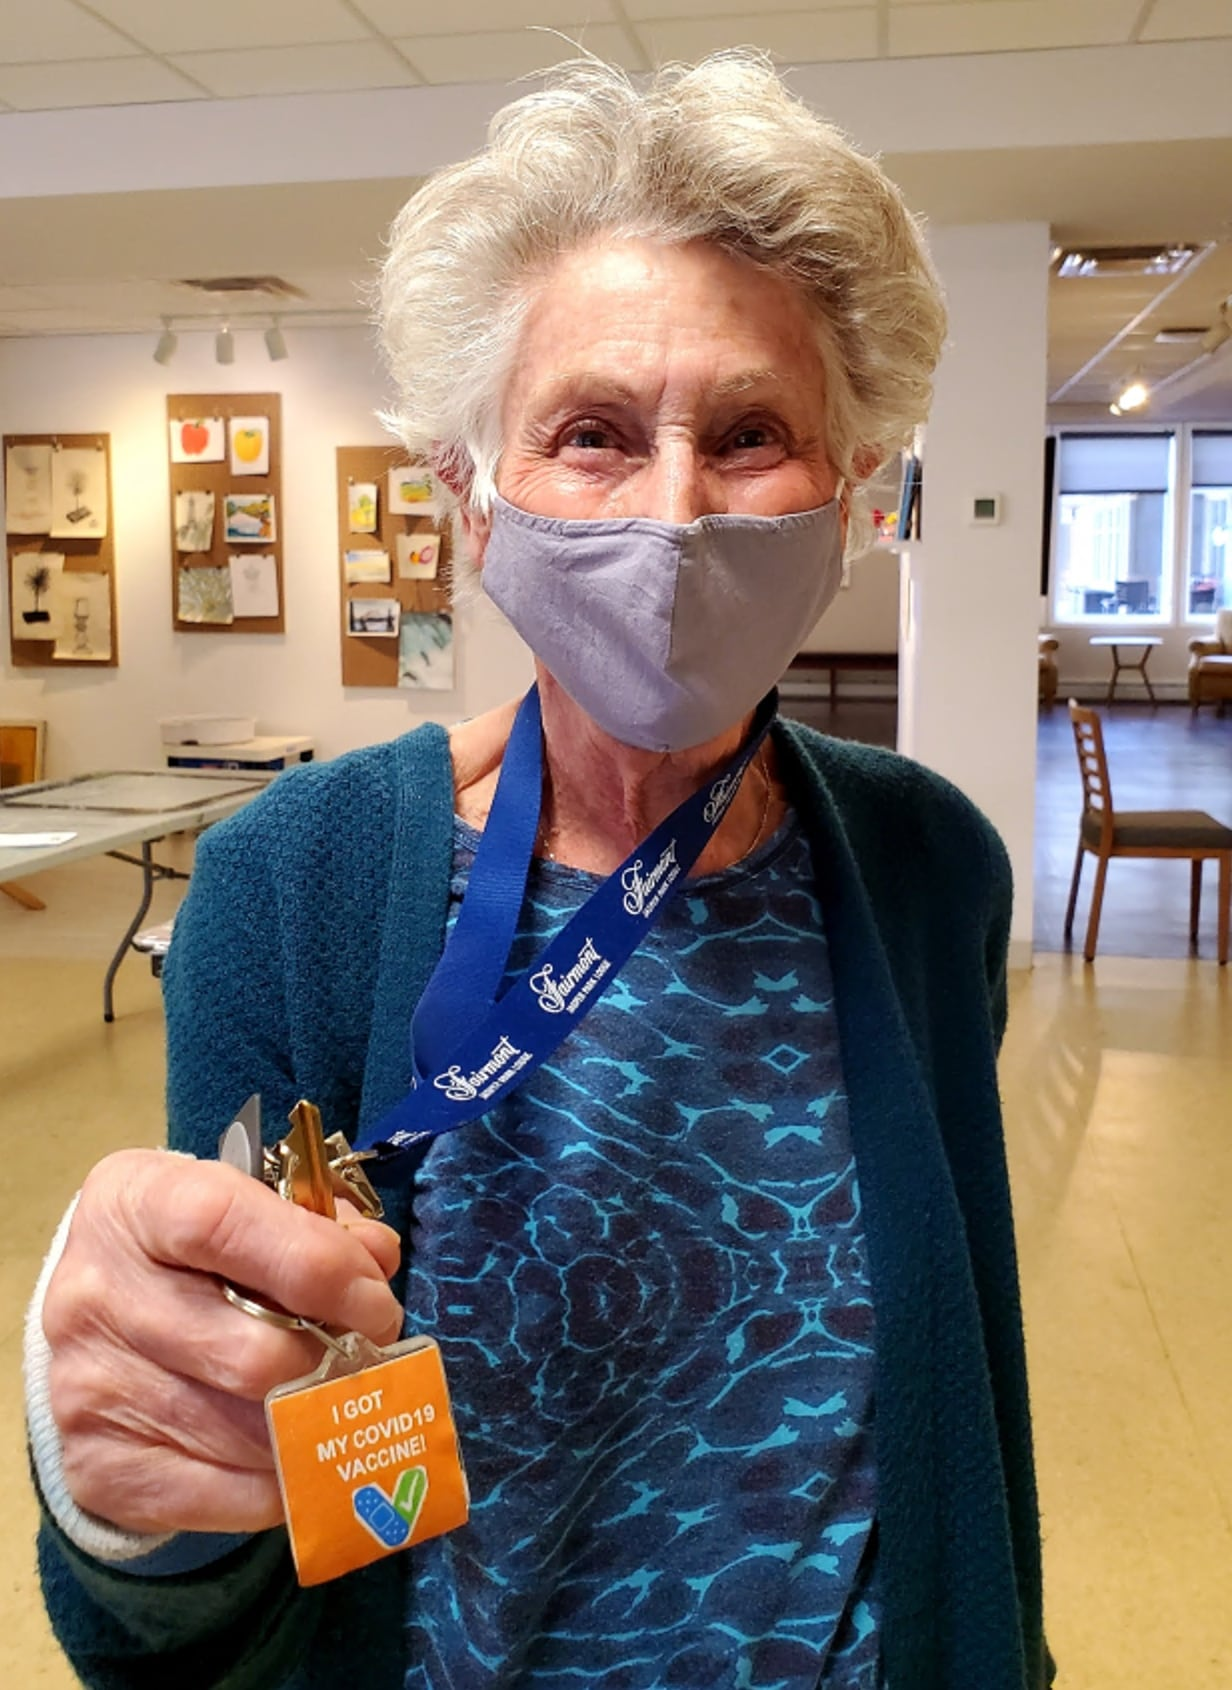 Fish Creek resident Maureen Miller shows off her vaccination sticker